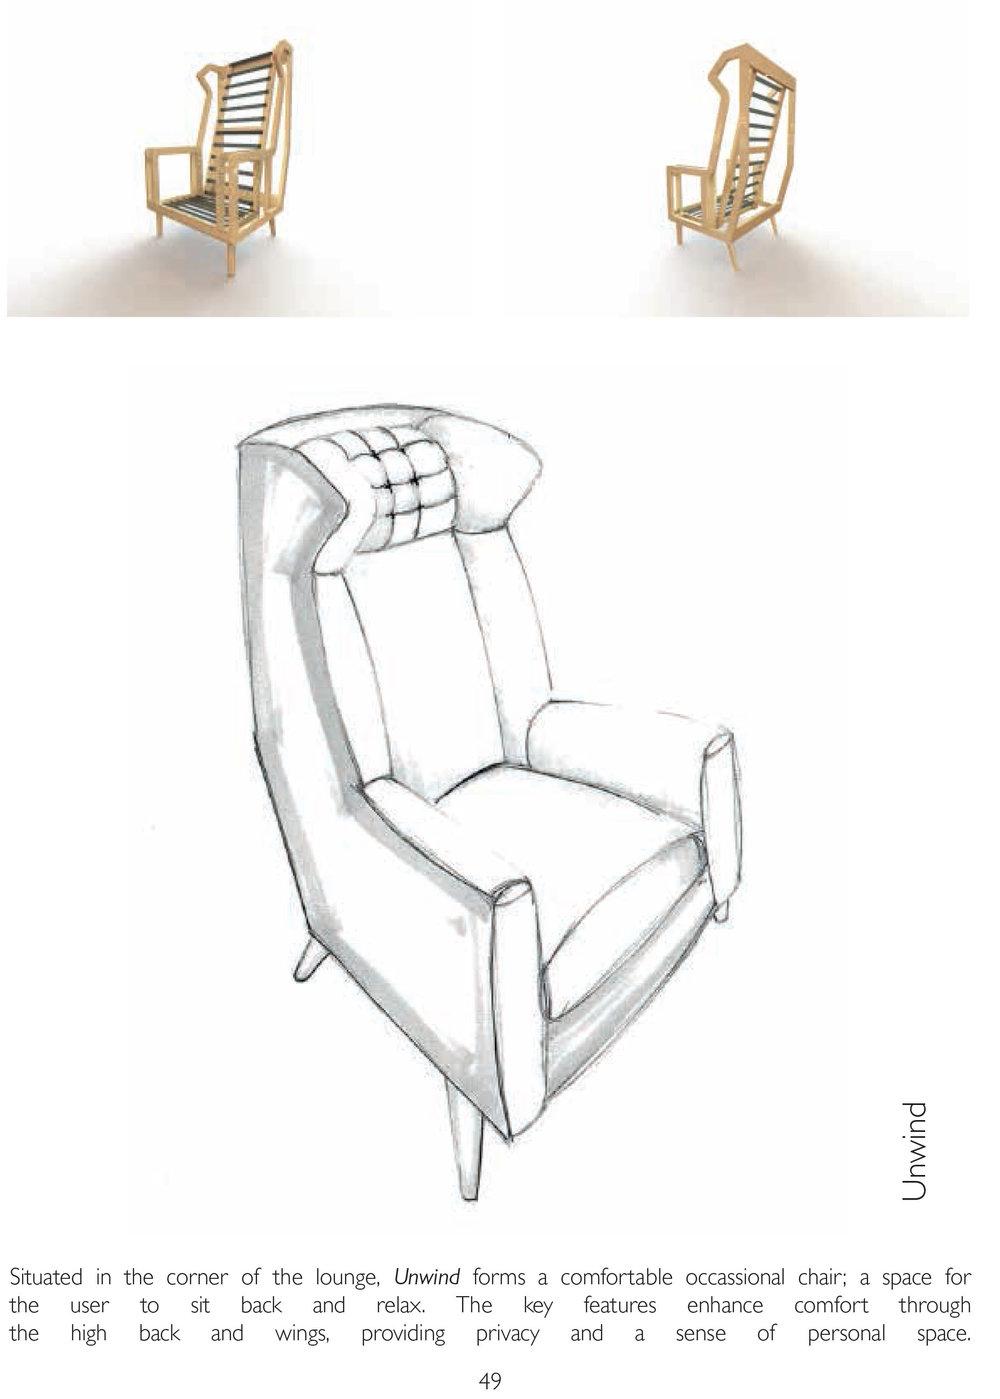 Ba furniture product design brochure 2017 ntu design for Product design chair